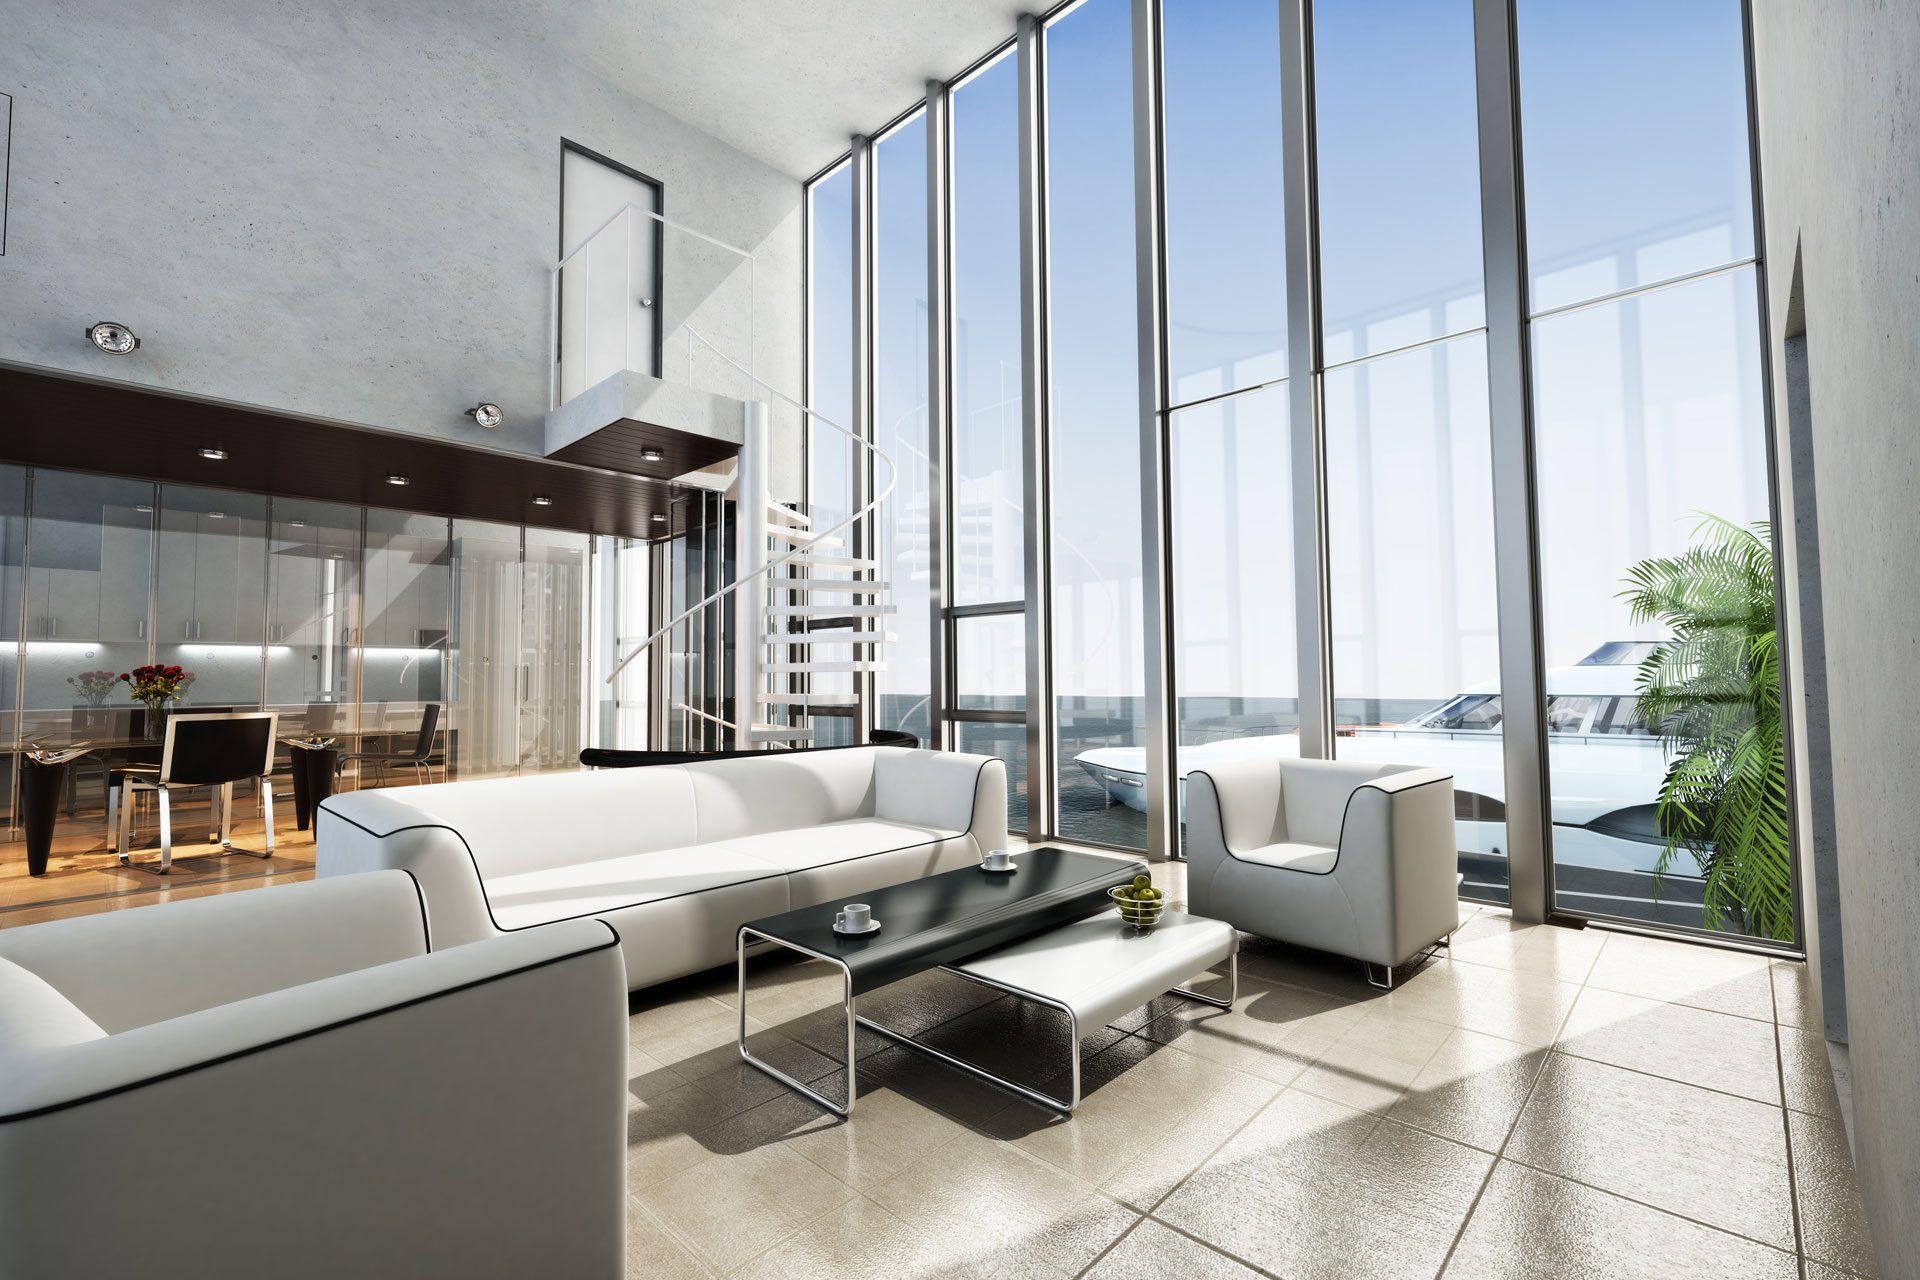 D Alex Vaughn sells luxury condos in the Miami Area.